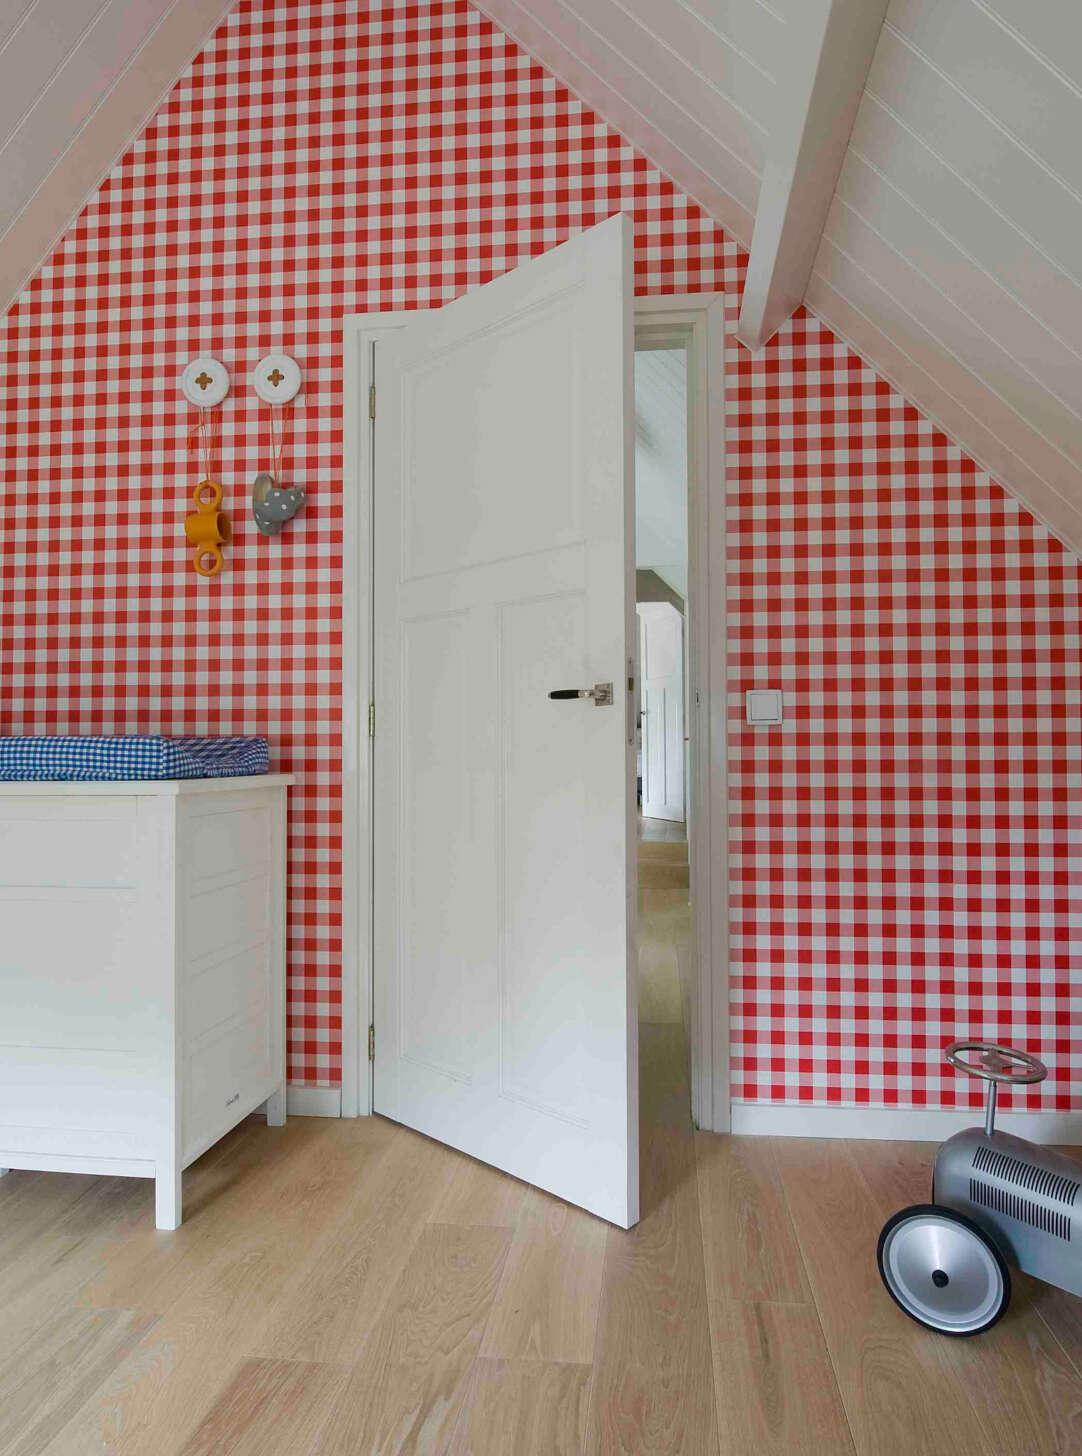 Oak landmark saltram plank floor in bedroom with toy car and gingham wallpaper